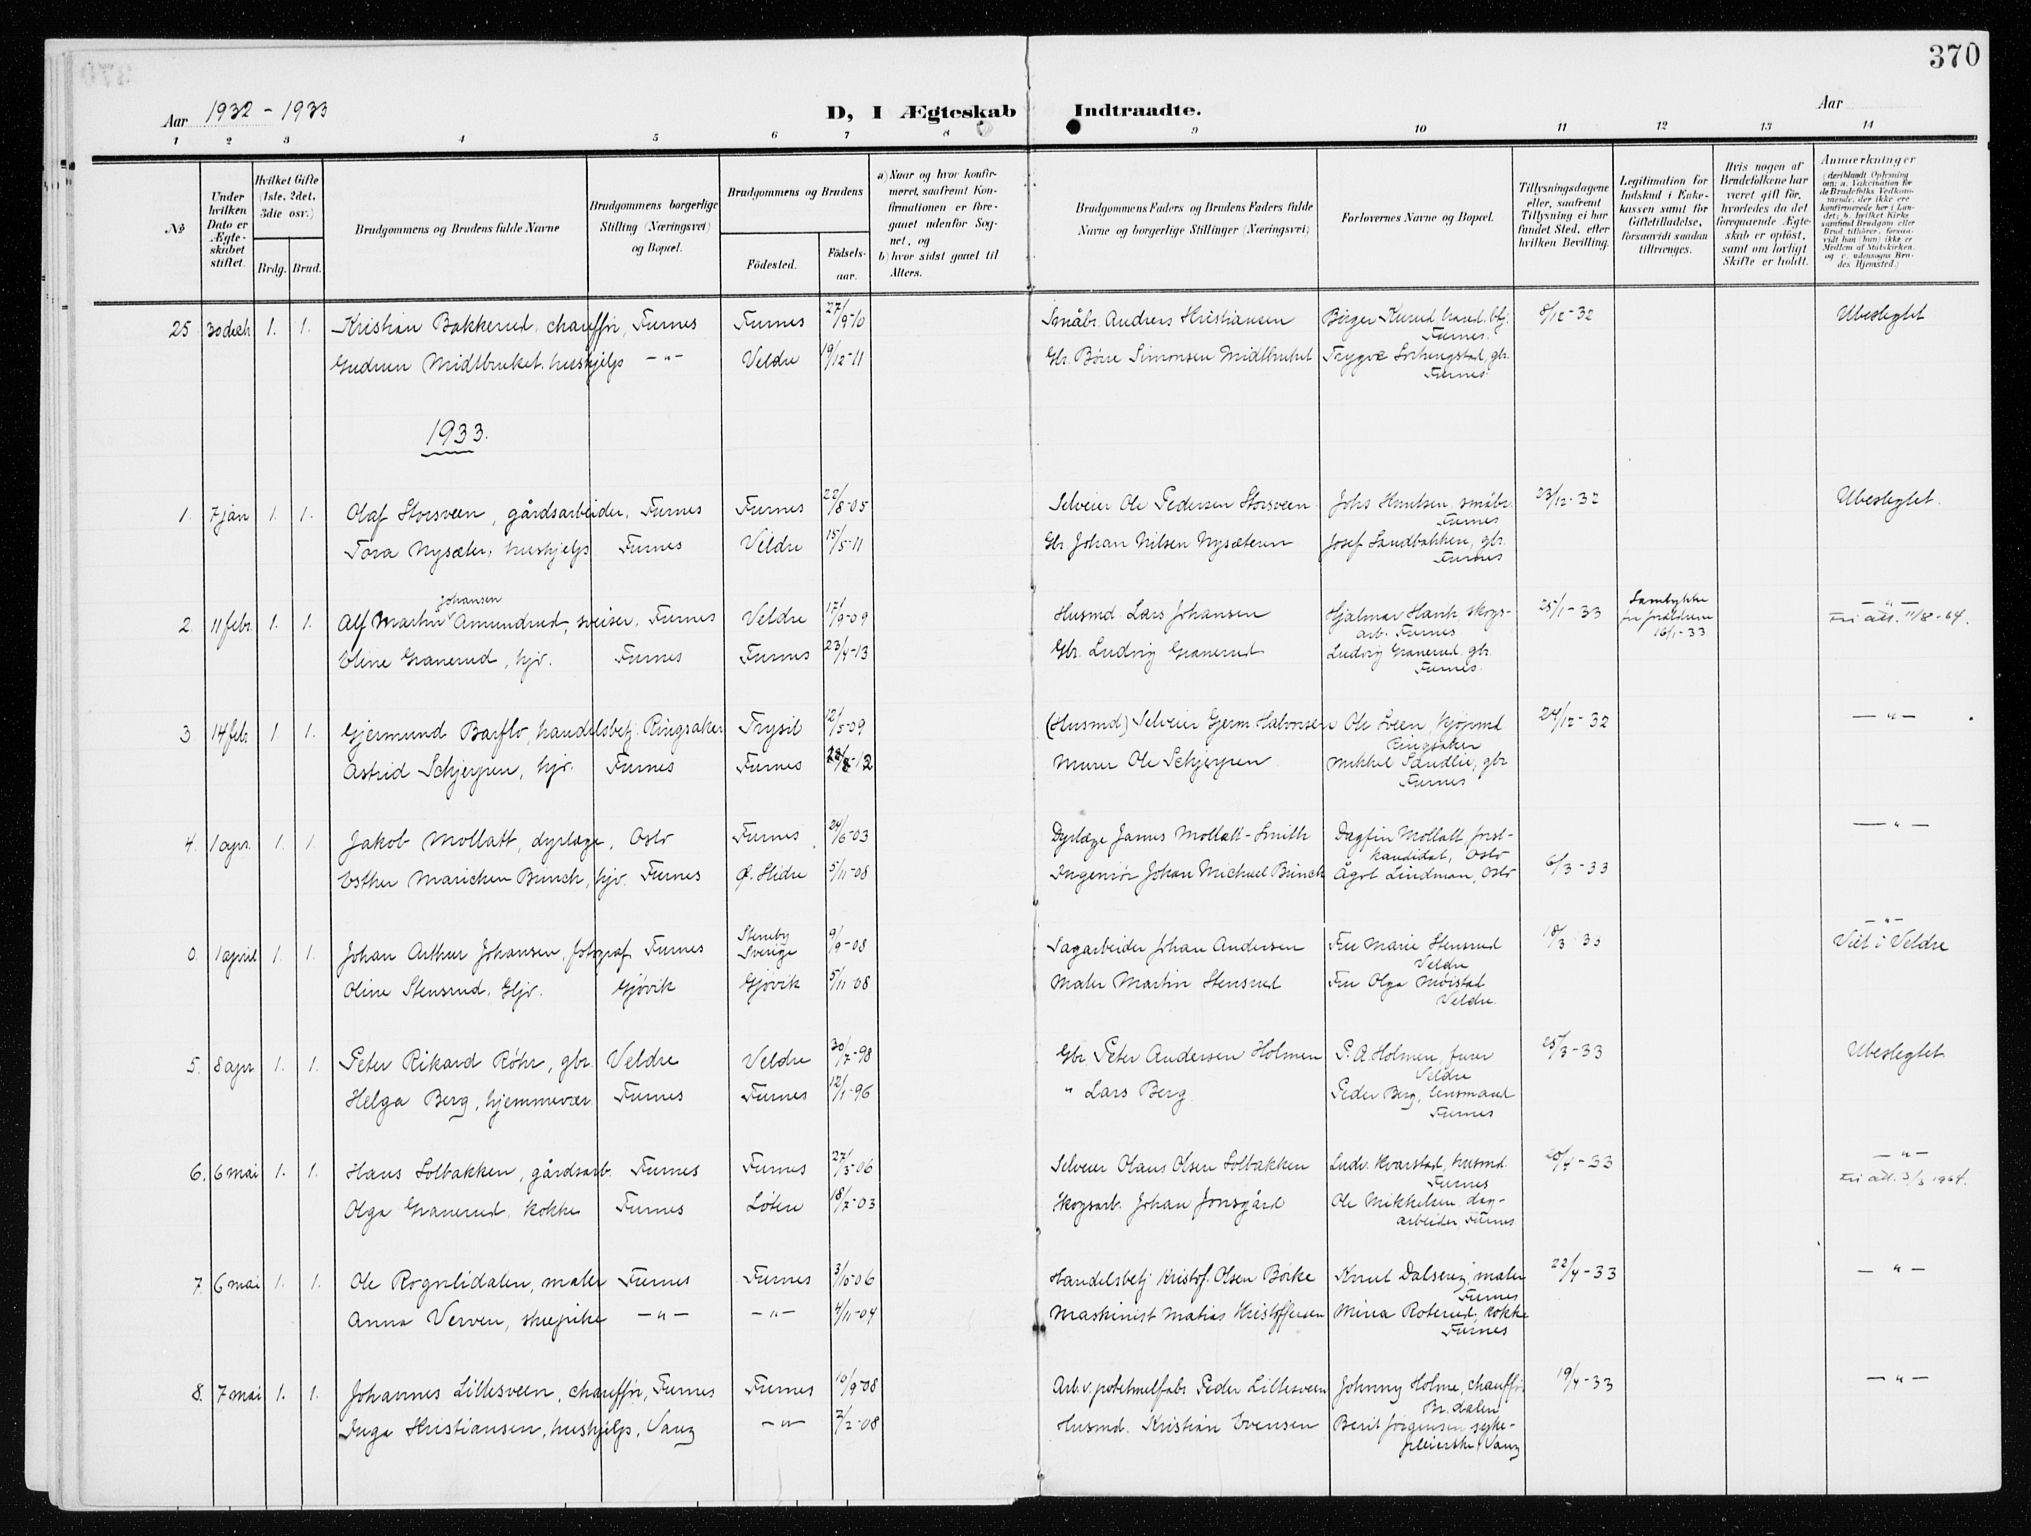 SAH, Furnes prestekontor, K/Ka/L0001: Ministerialbok nr. 1, 1907-1935, s. 370